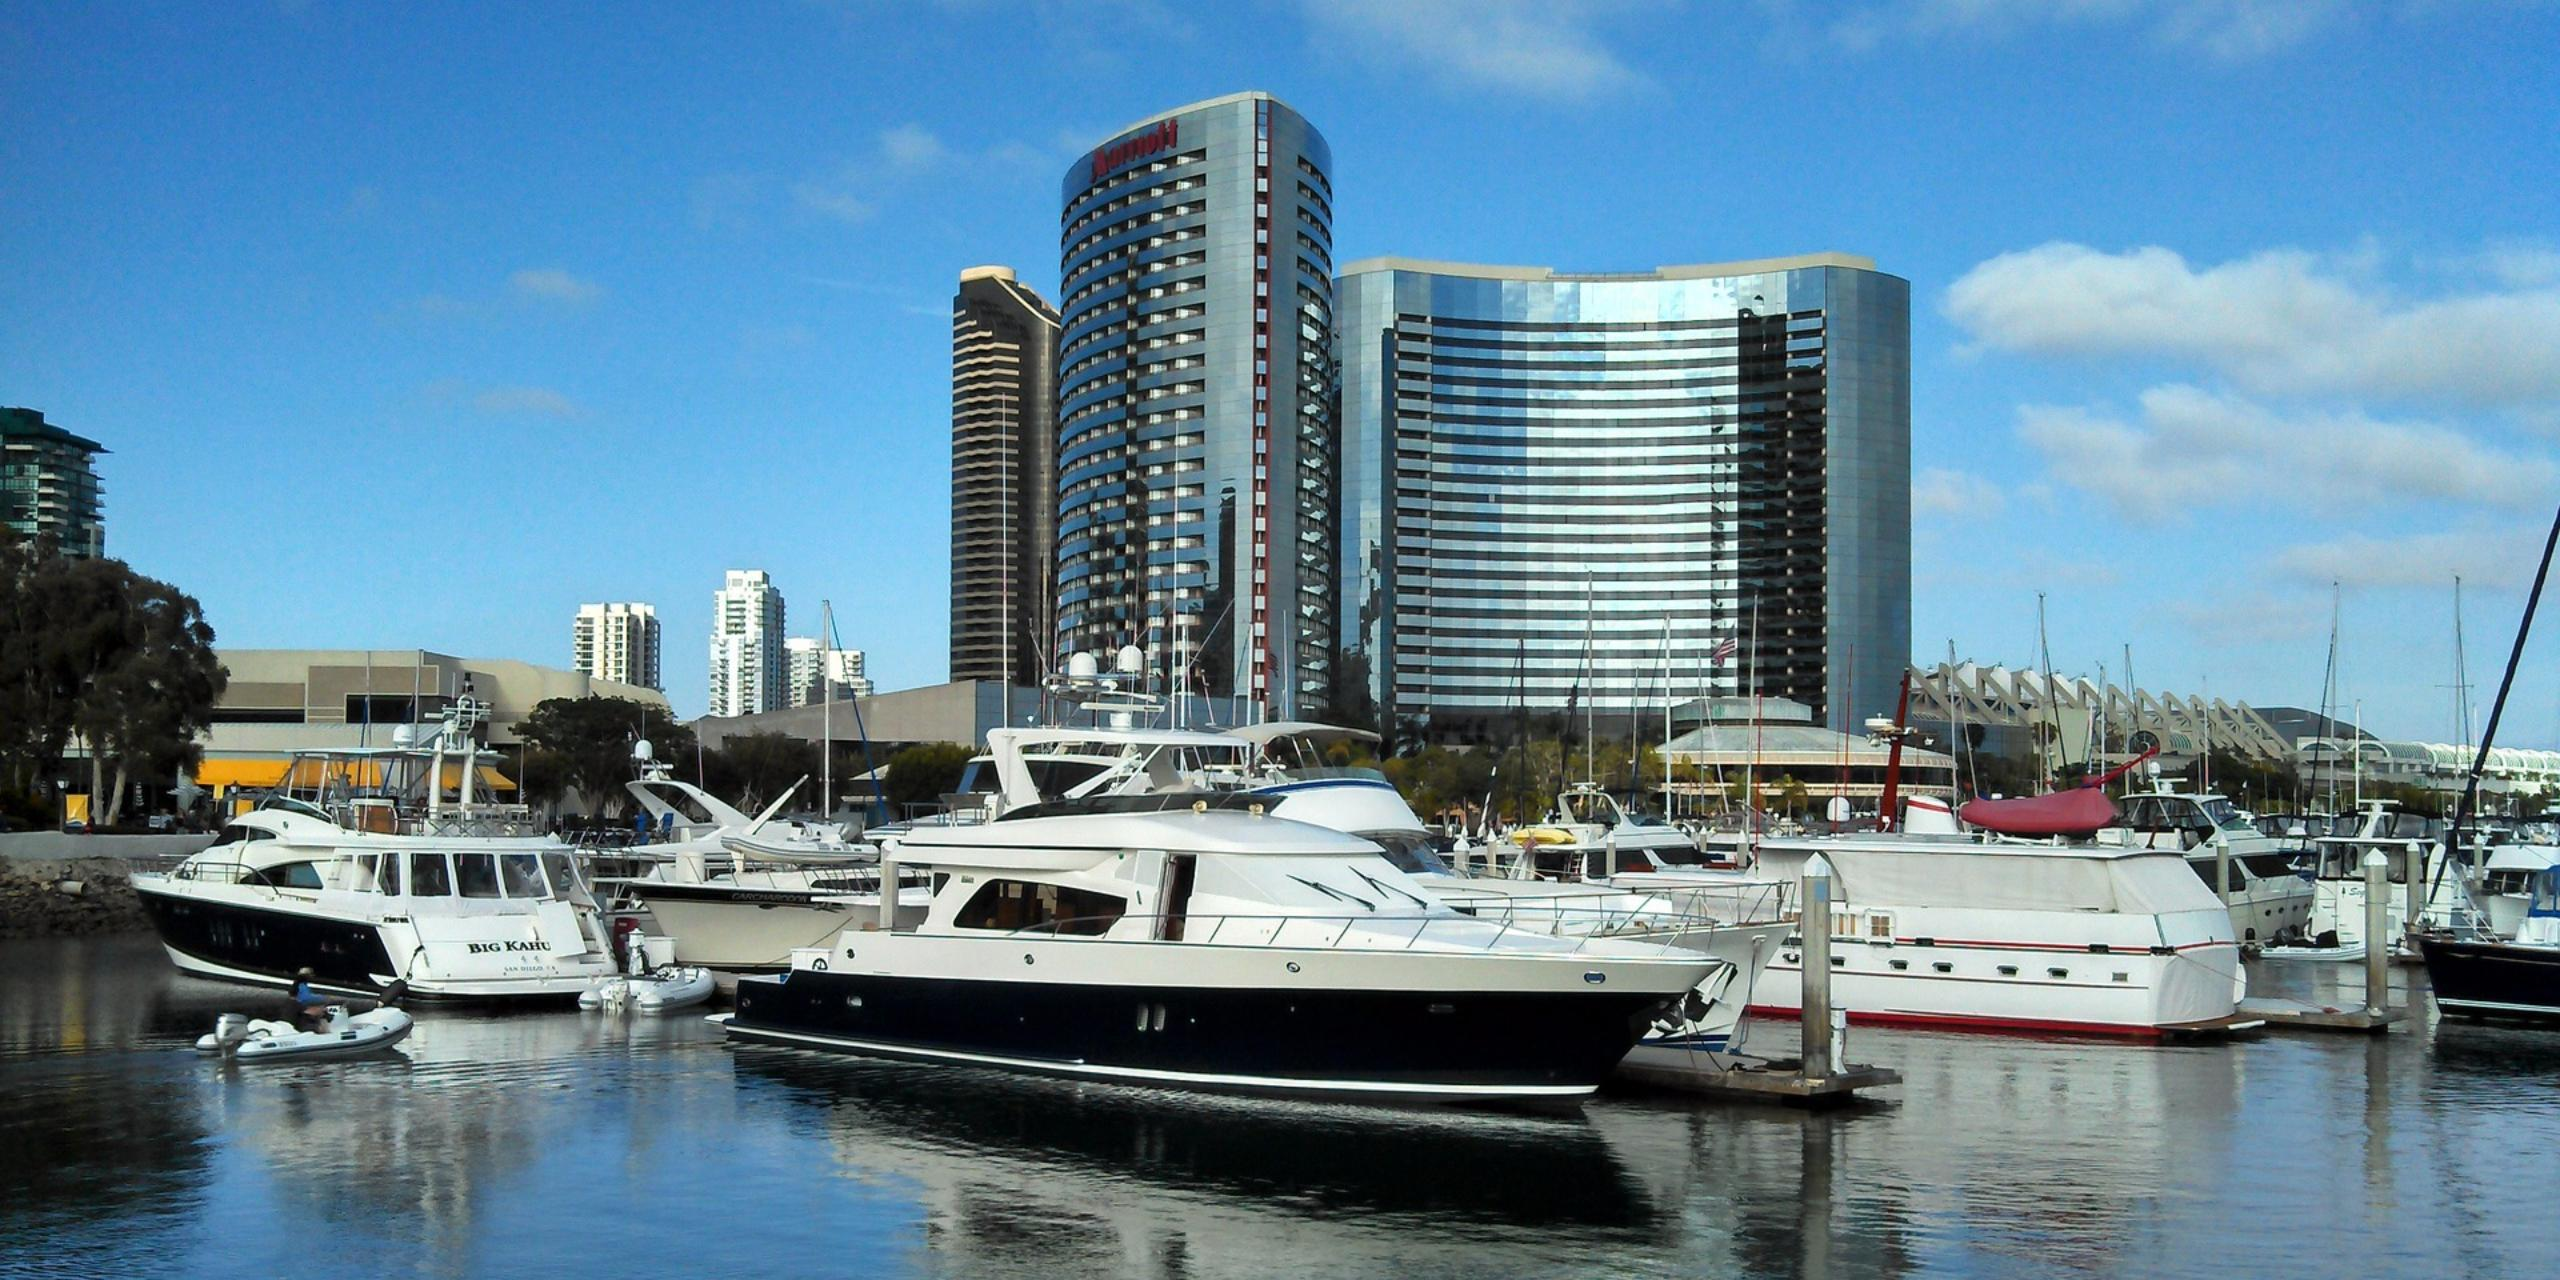 Bold San Diego Real Estate Prediction Over The Next Half Decade